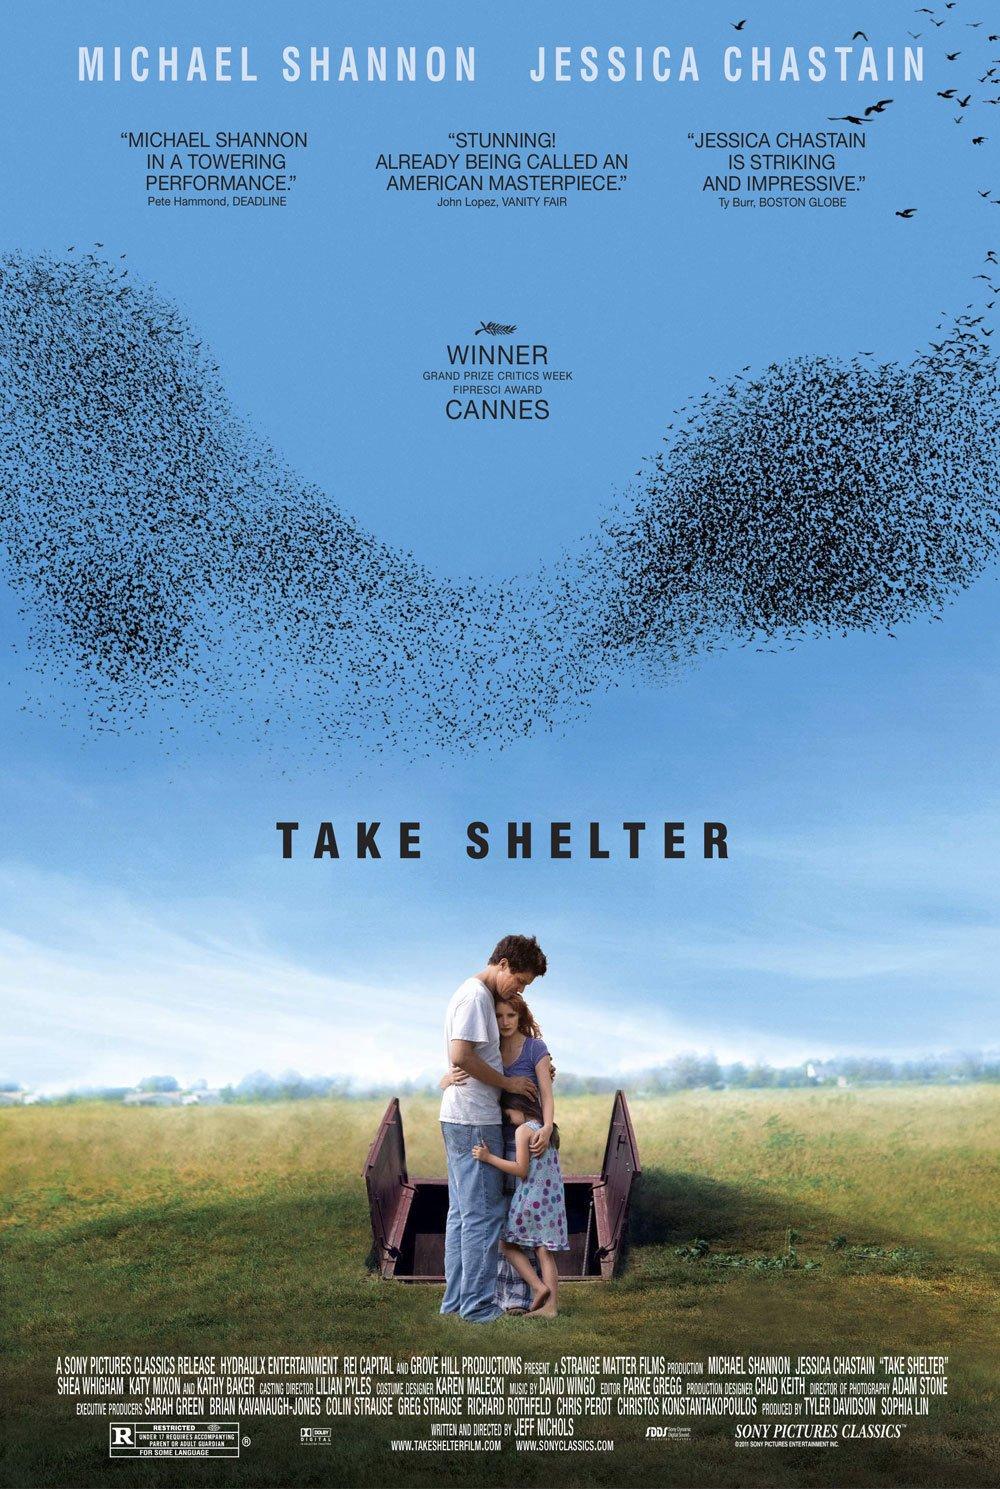 "TAKE SHELTER Original Movie Poster * Michael Shannon * 27"" x 40"" Rare 2011 Mint"